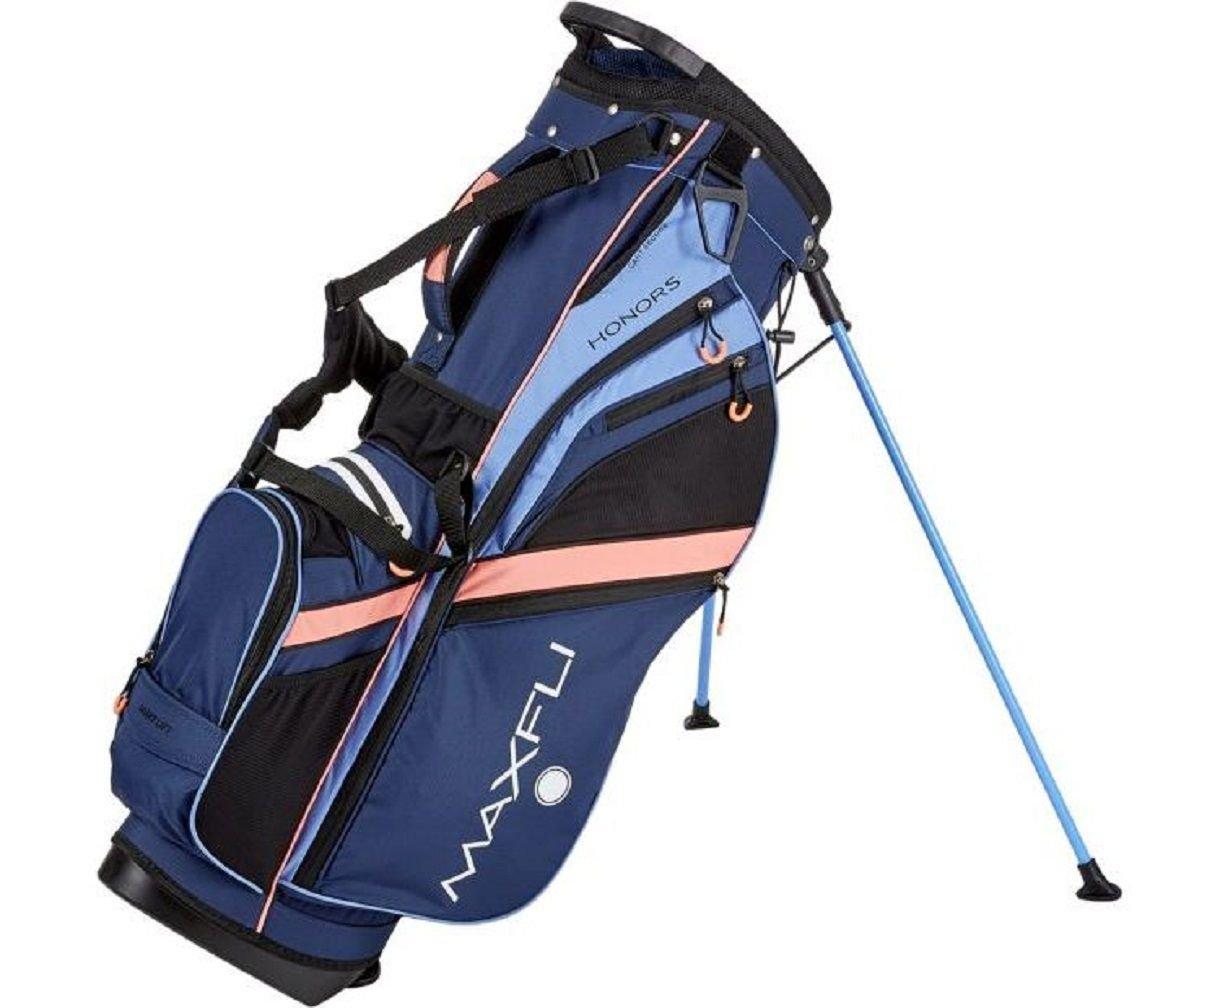 Maxfli Women's 2018 Stand Golf Bag - 6 Way - 8 Pockets - Navy/Coral/Purple